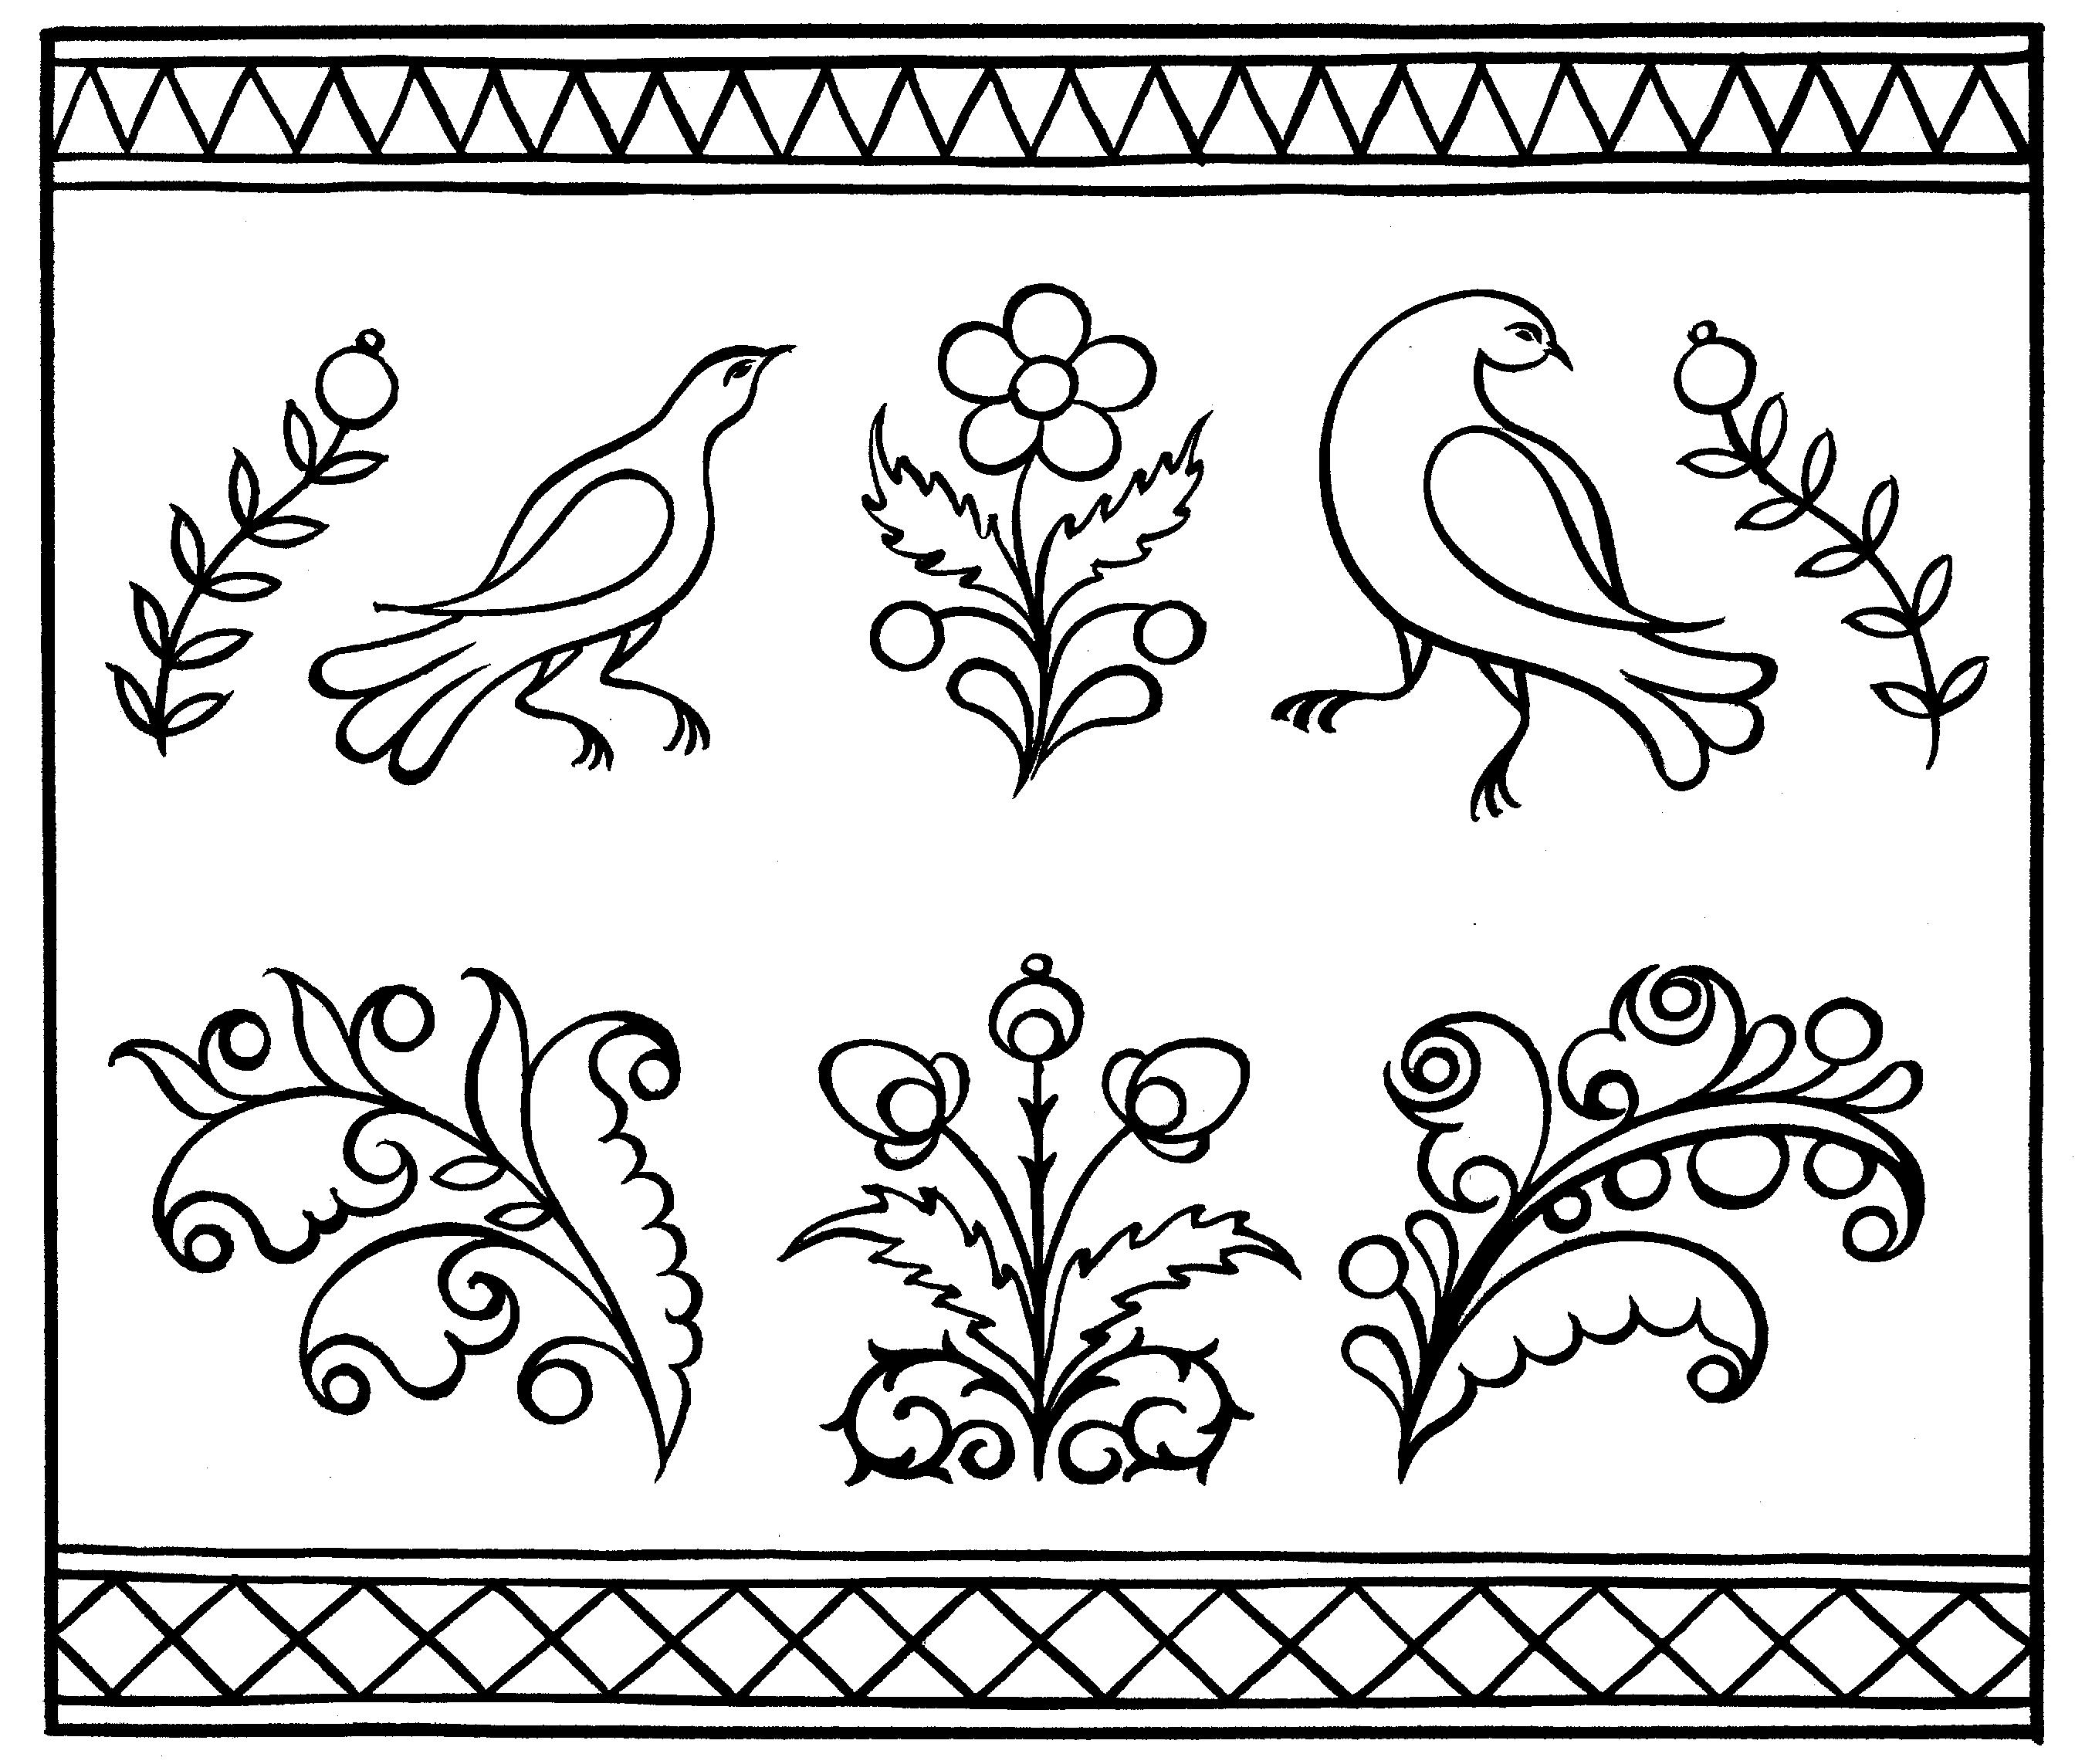 Русские орнаменты картинки трафареты